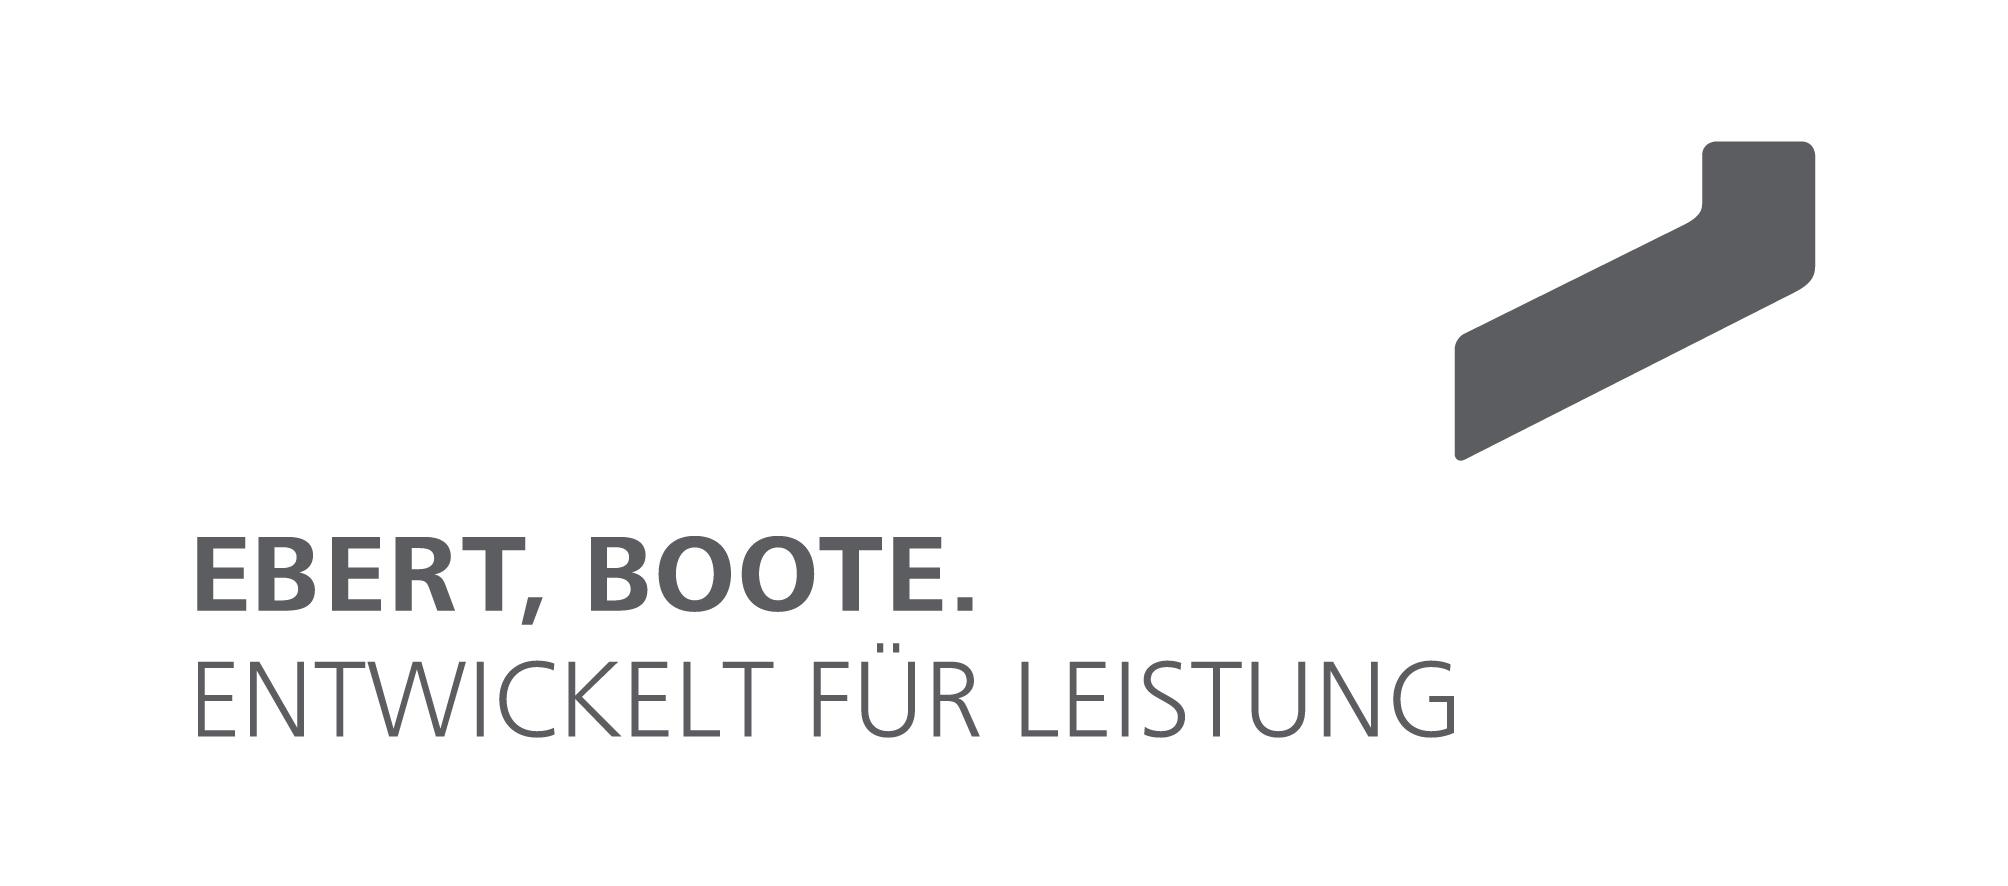 EBERT, BOOTE.